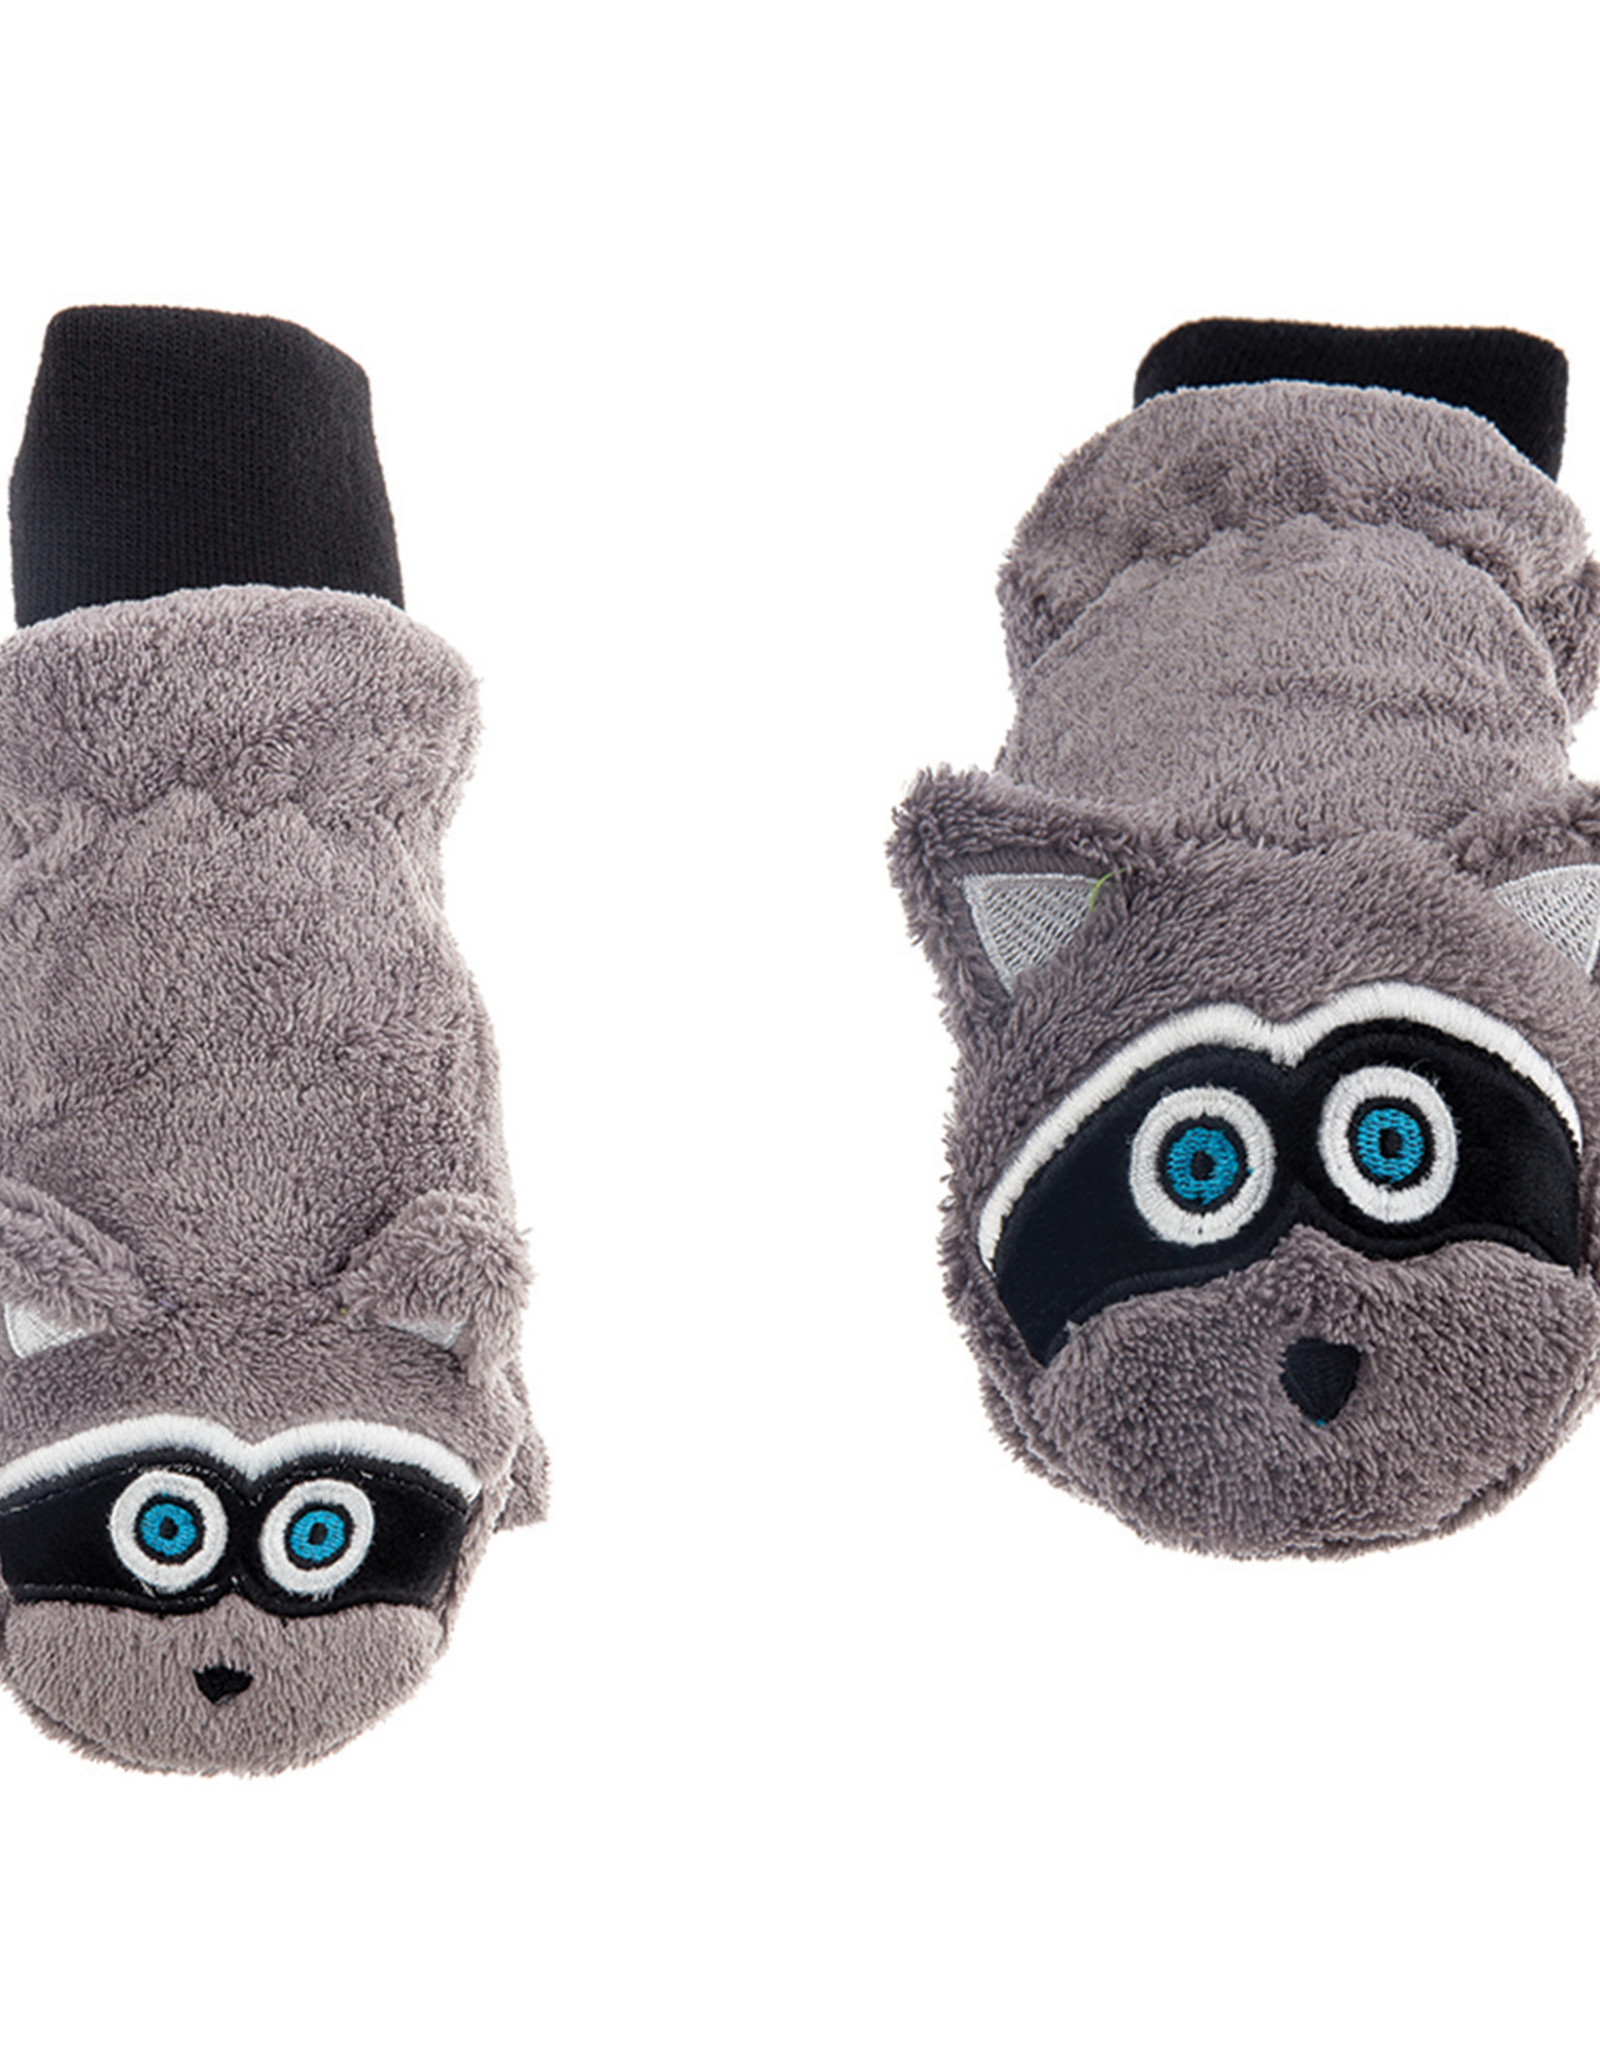 FlapJackKids FlapJackKids Fleece Mitts - Raccoon